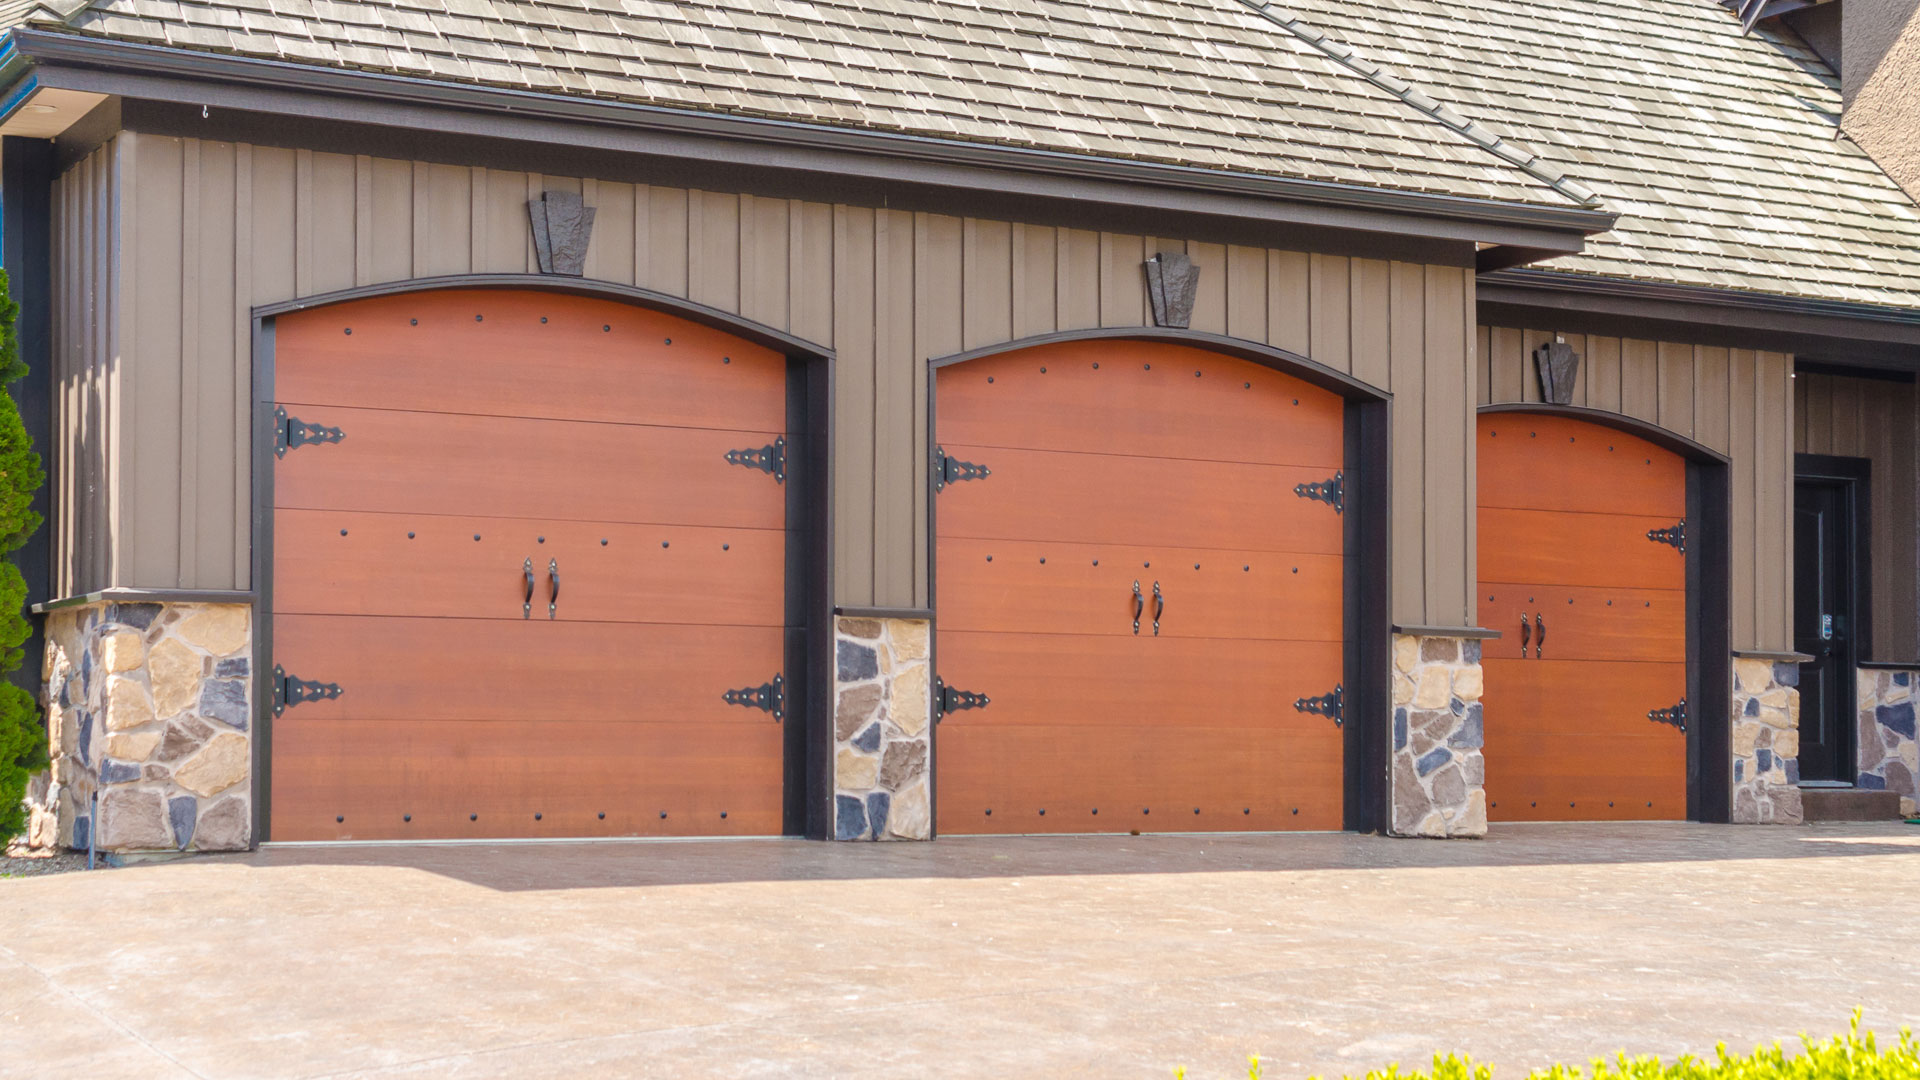 & LA Garage Pros Opens for Business in the Los Angeles Metropolitan Area